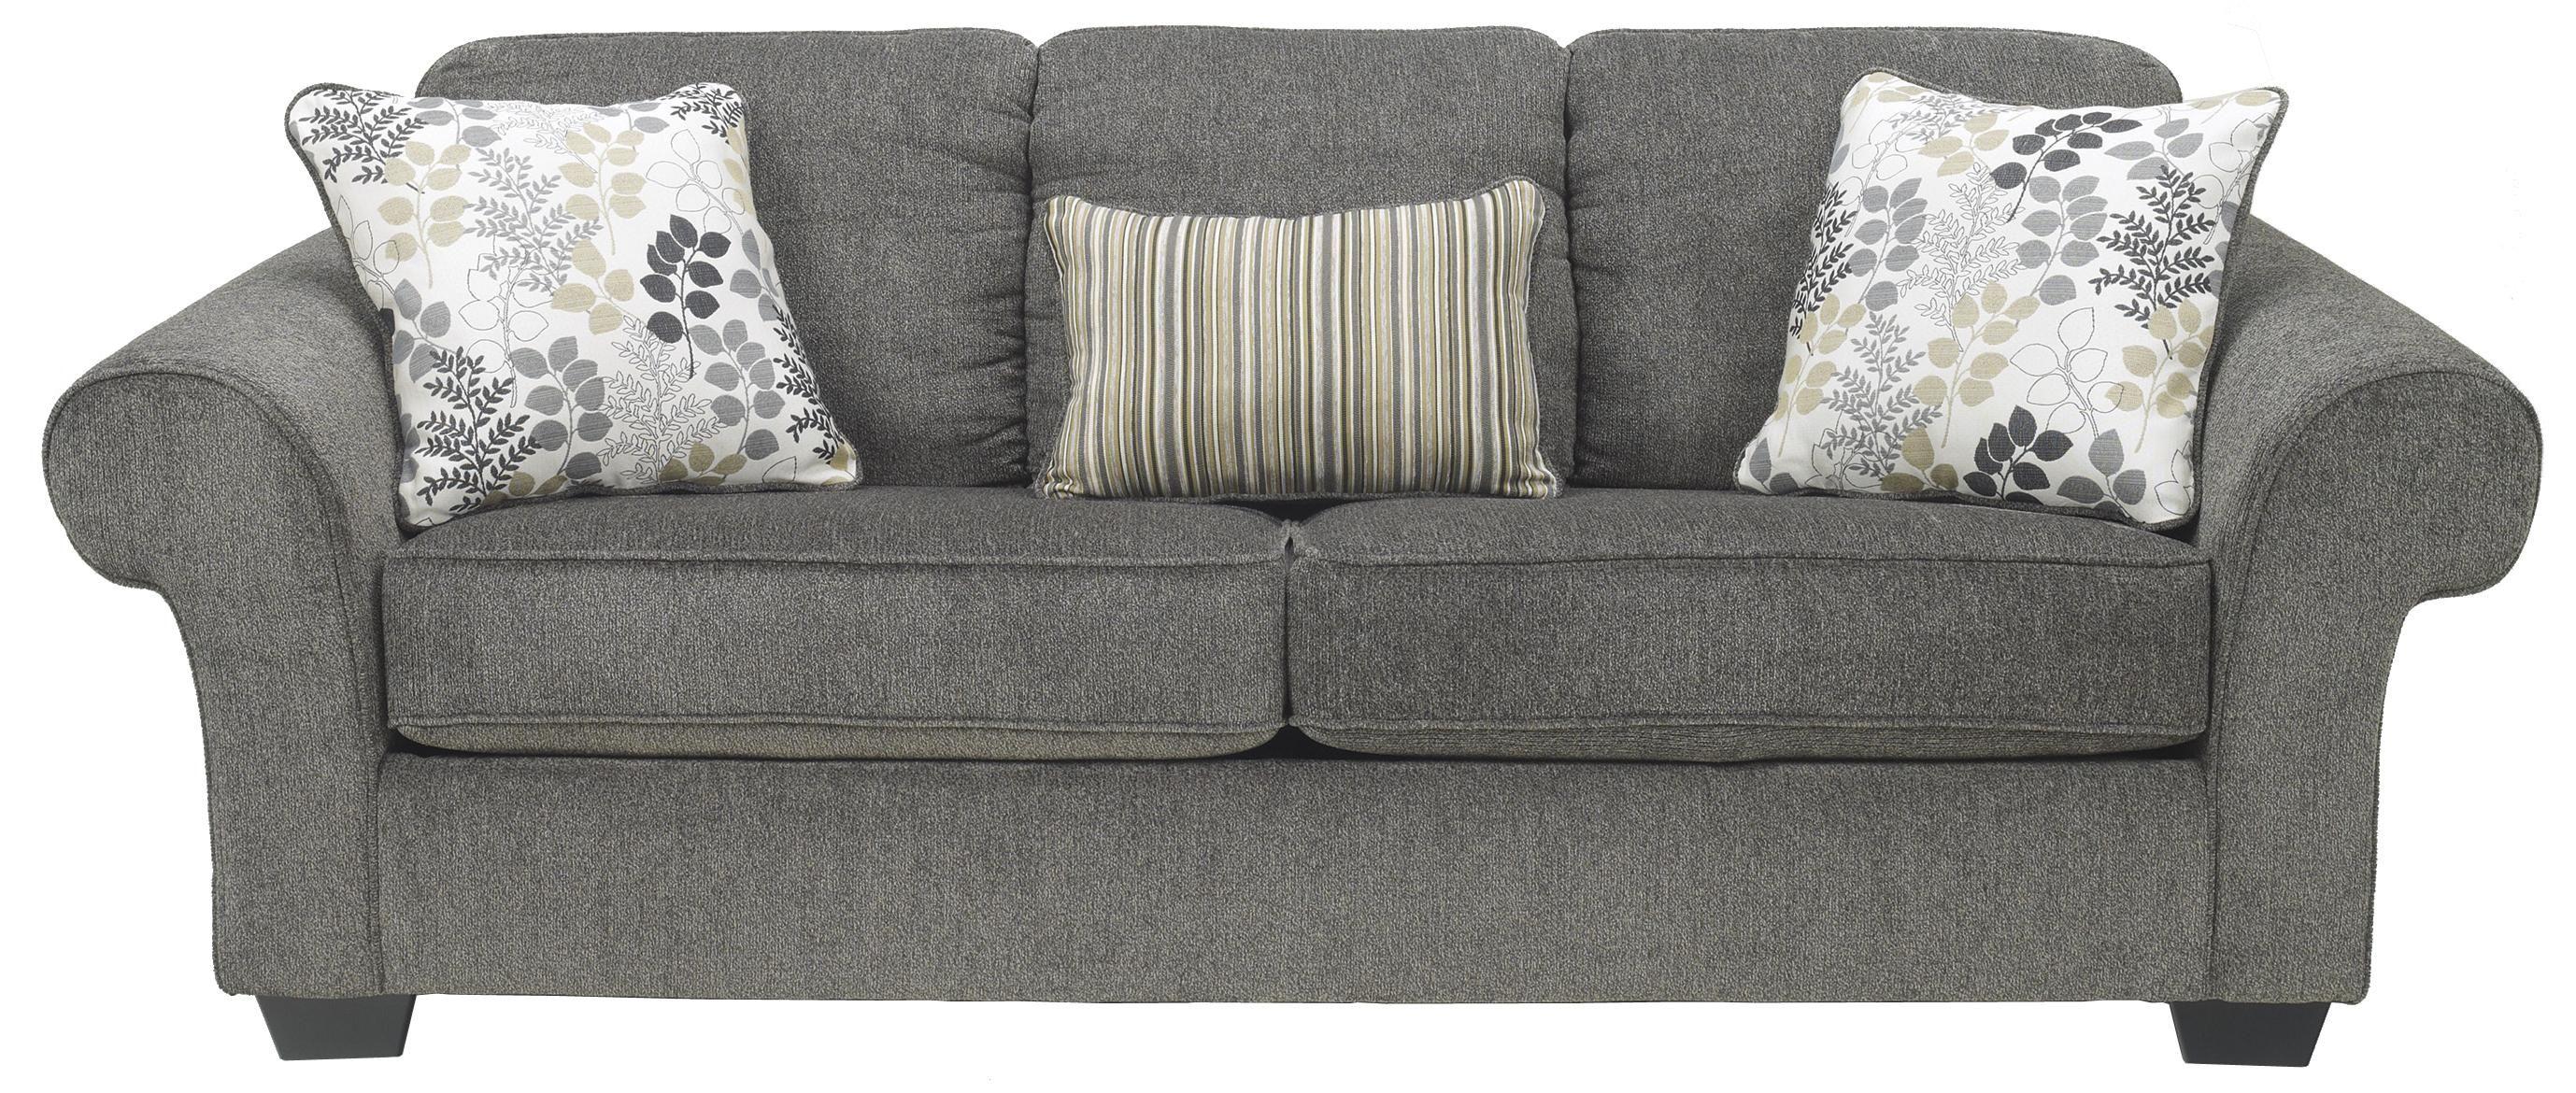 Ashley Furniture Makonnen Charcoal Sofa